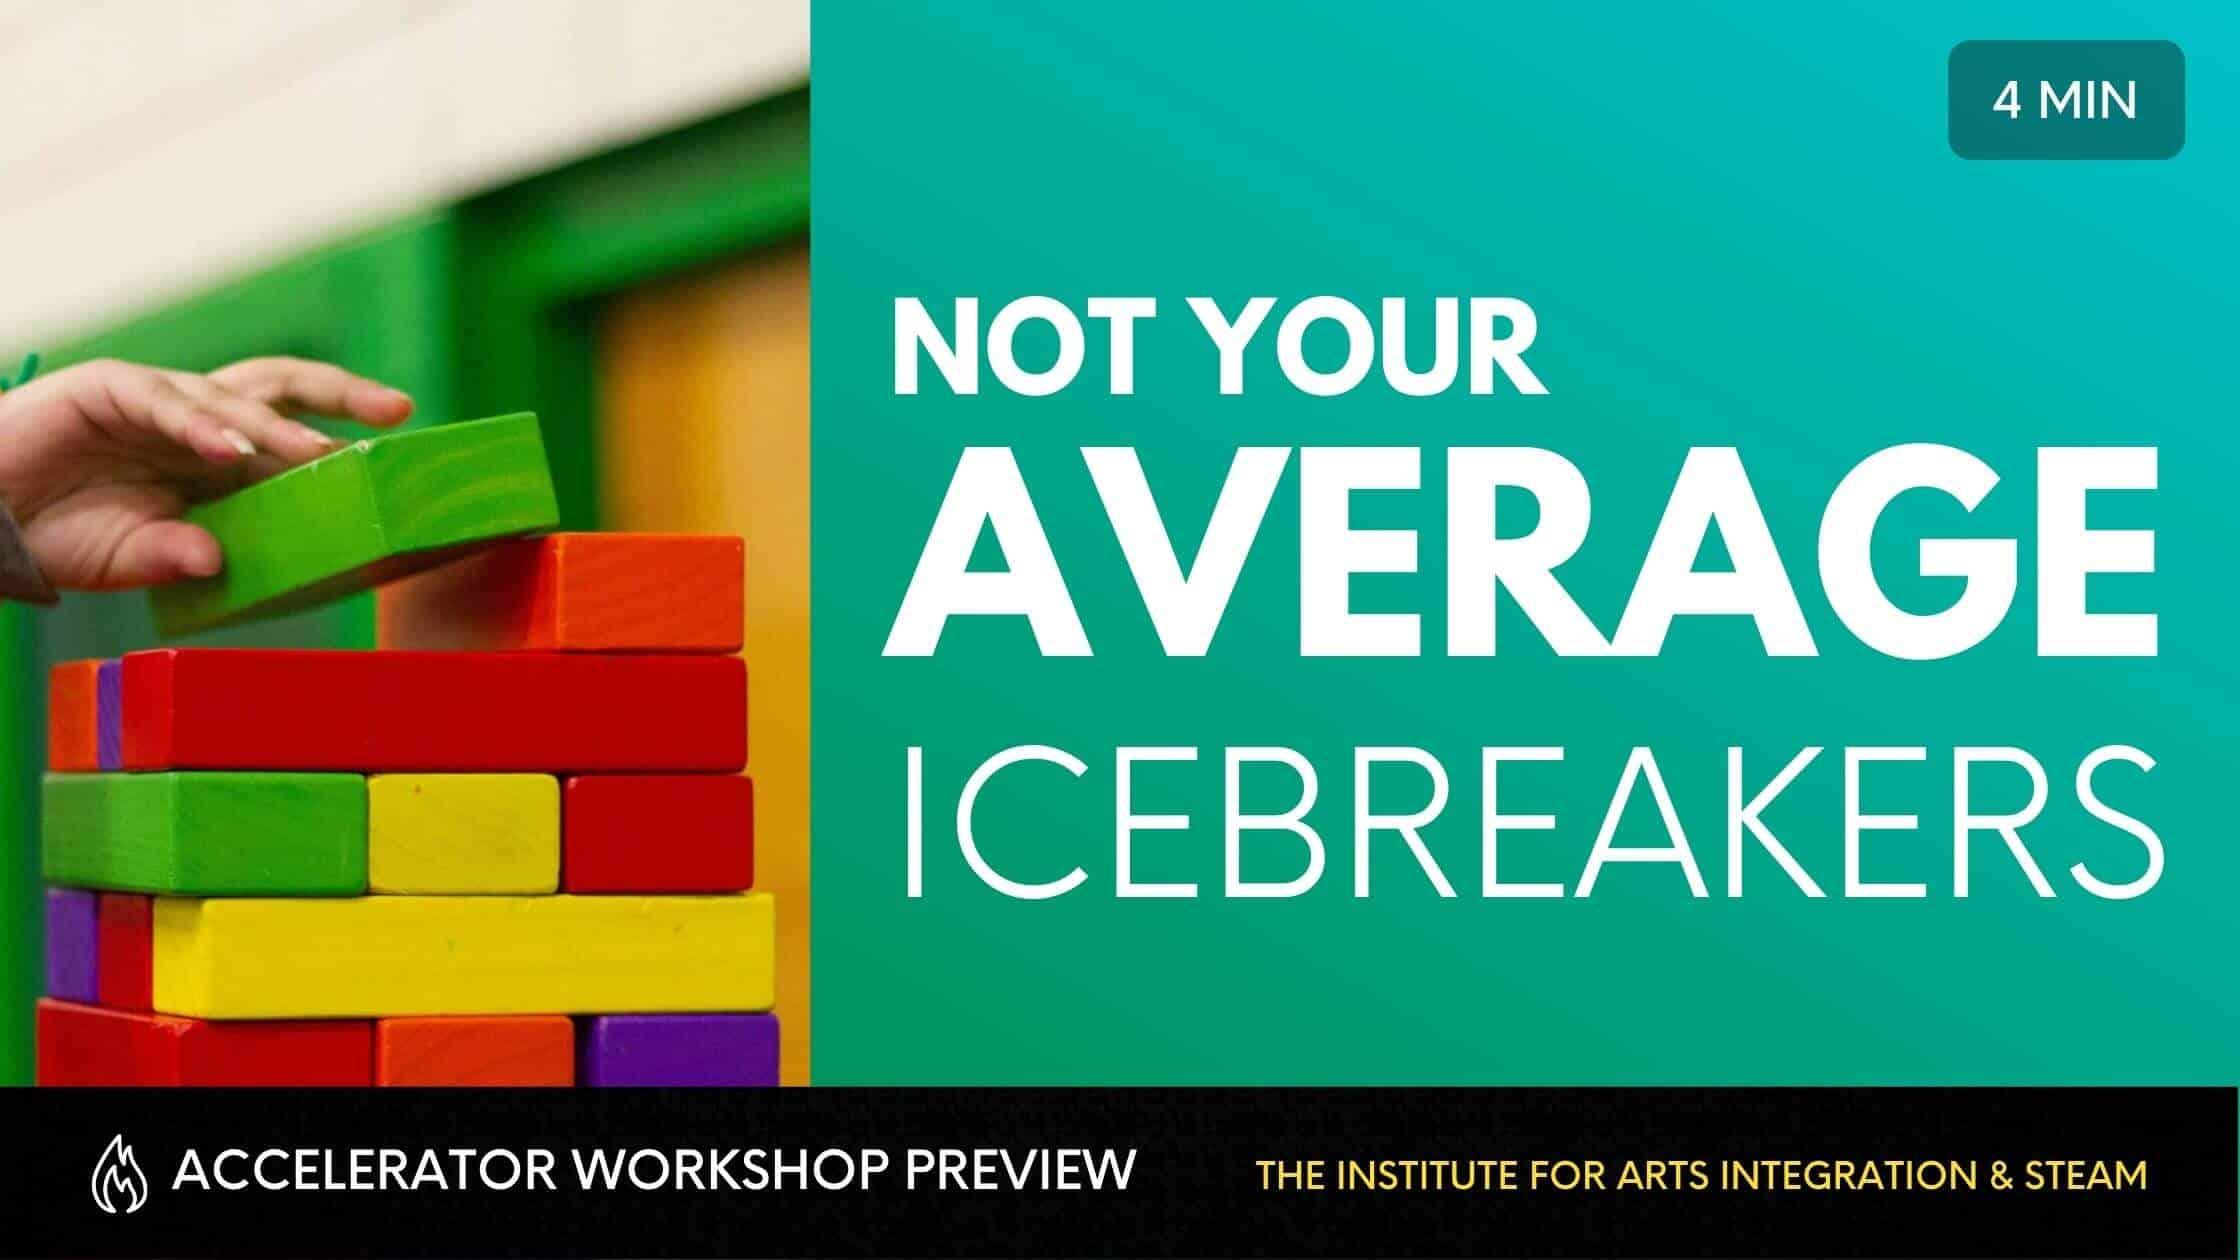 Not Your Average Icebreakers